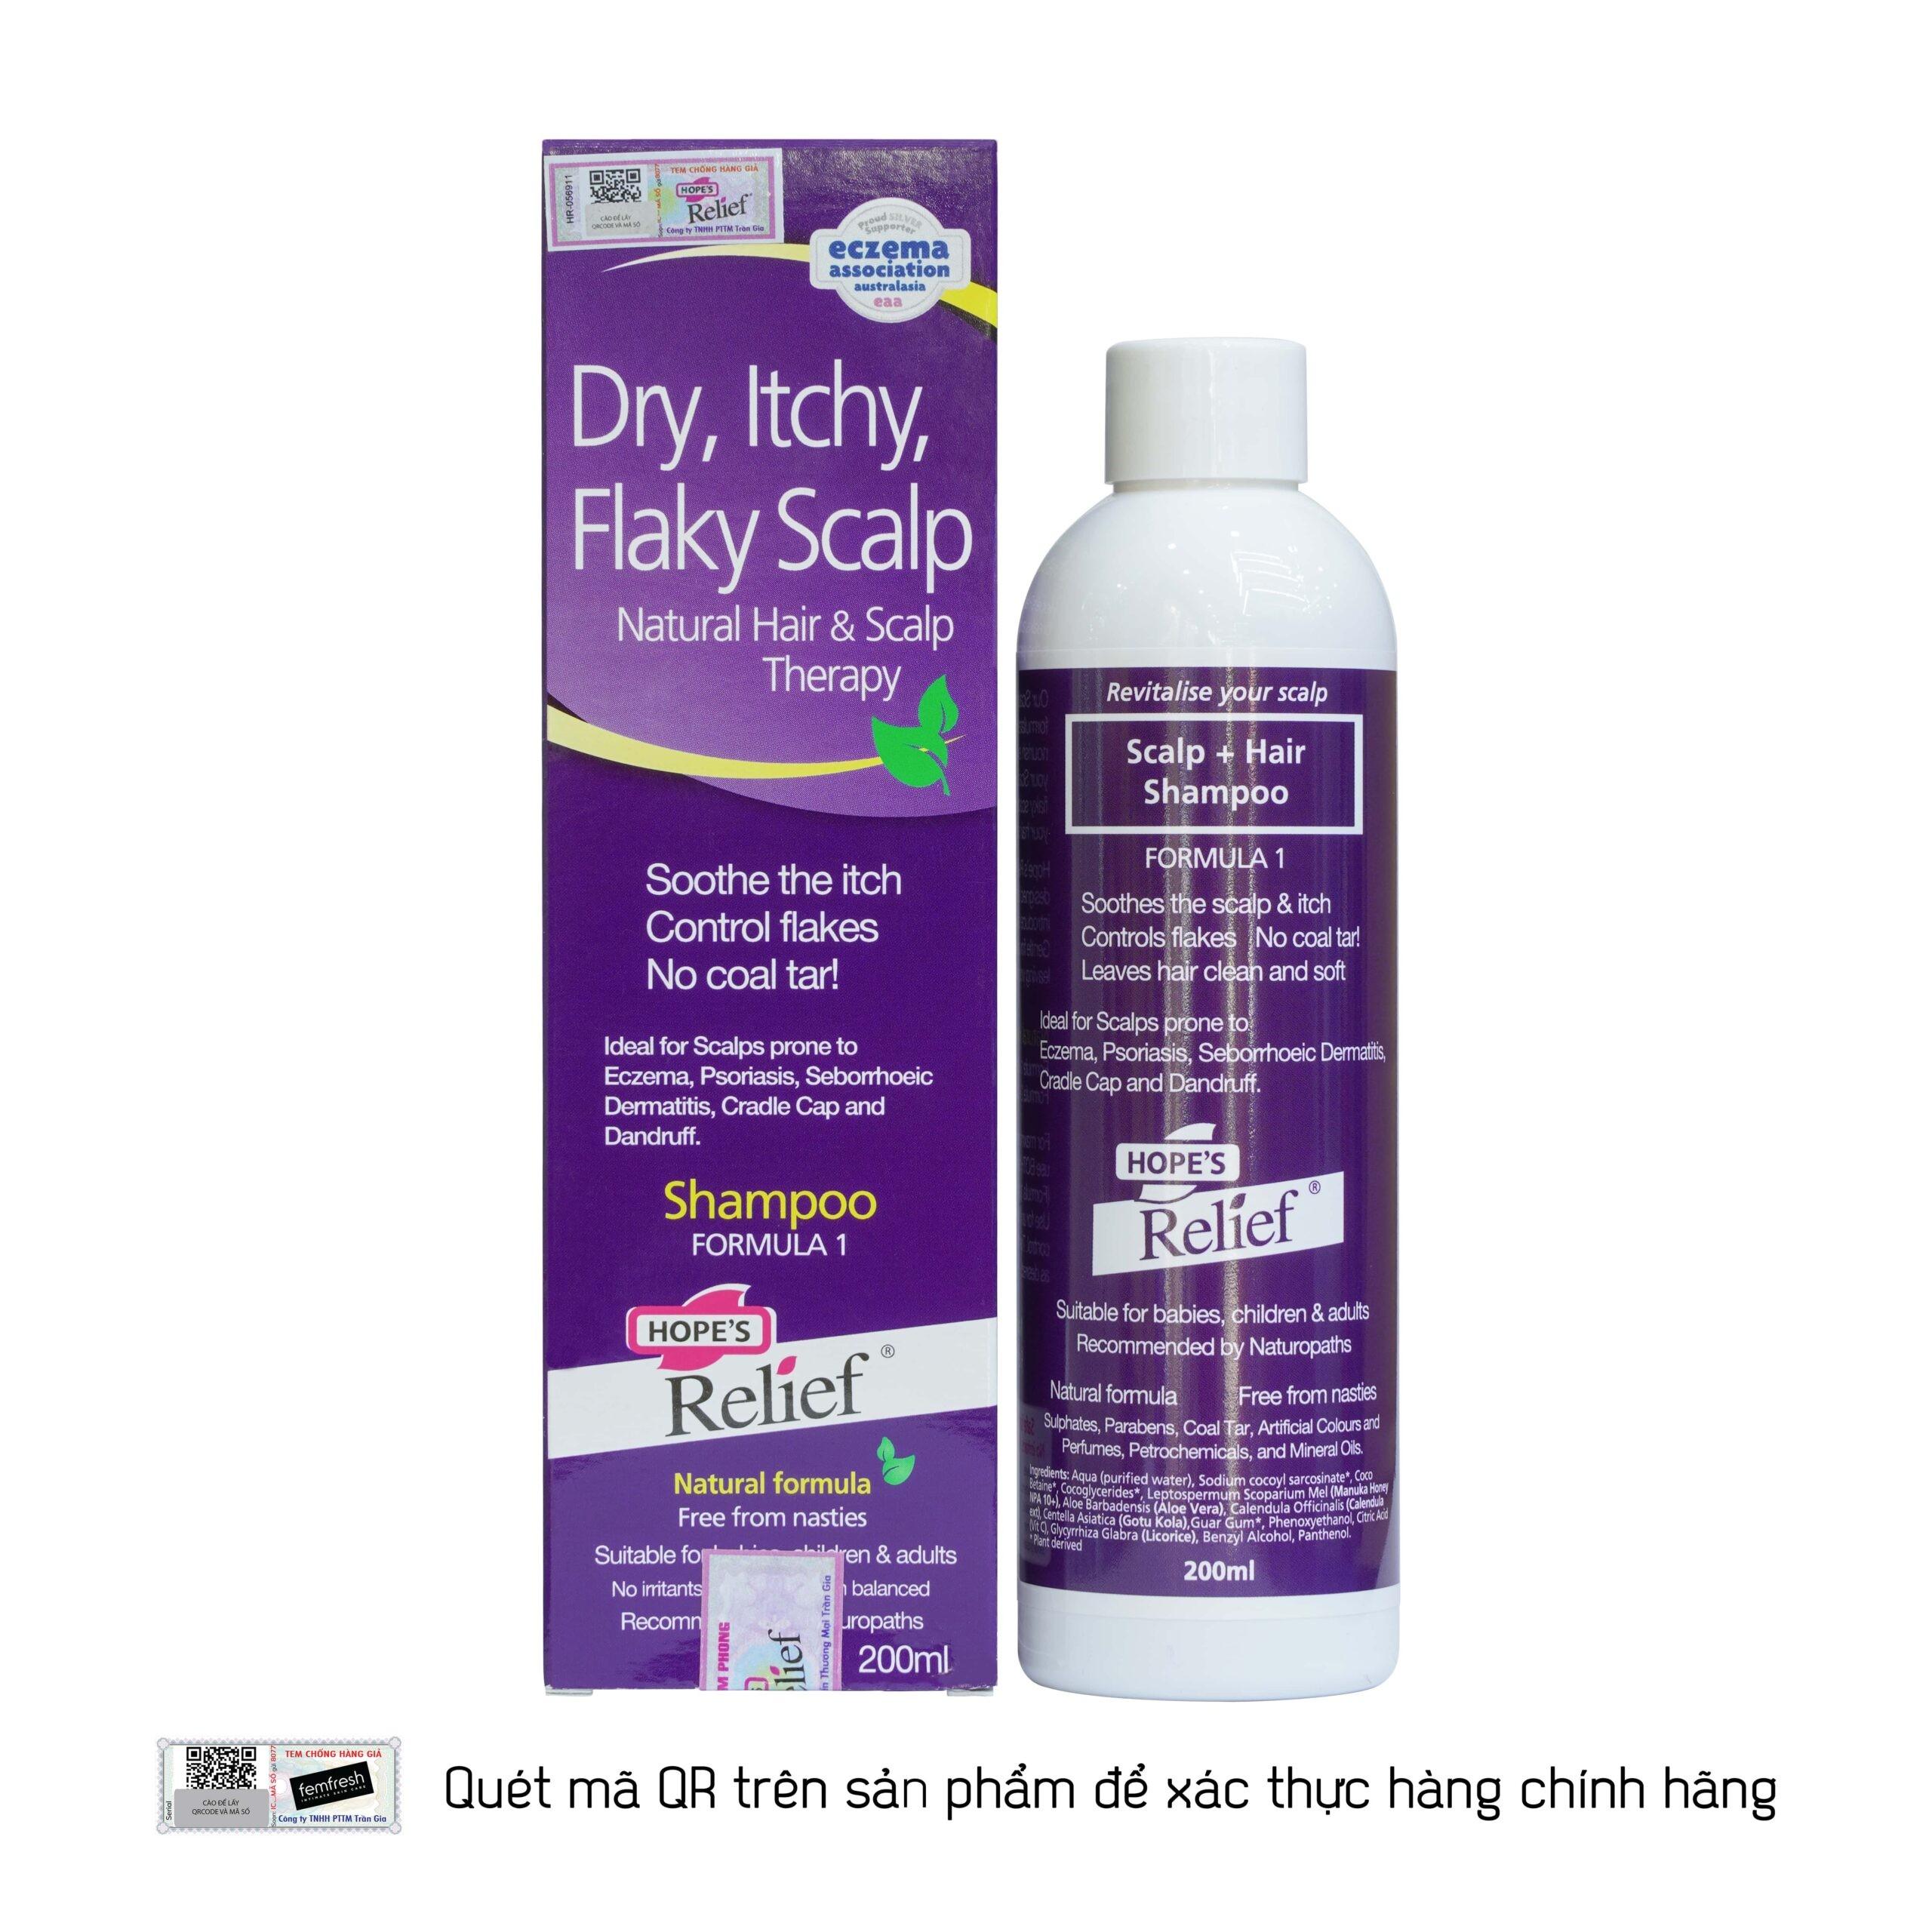 Dầu gội Hope's Relief Itchy Flaky Scalp Shampoo 200ml